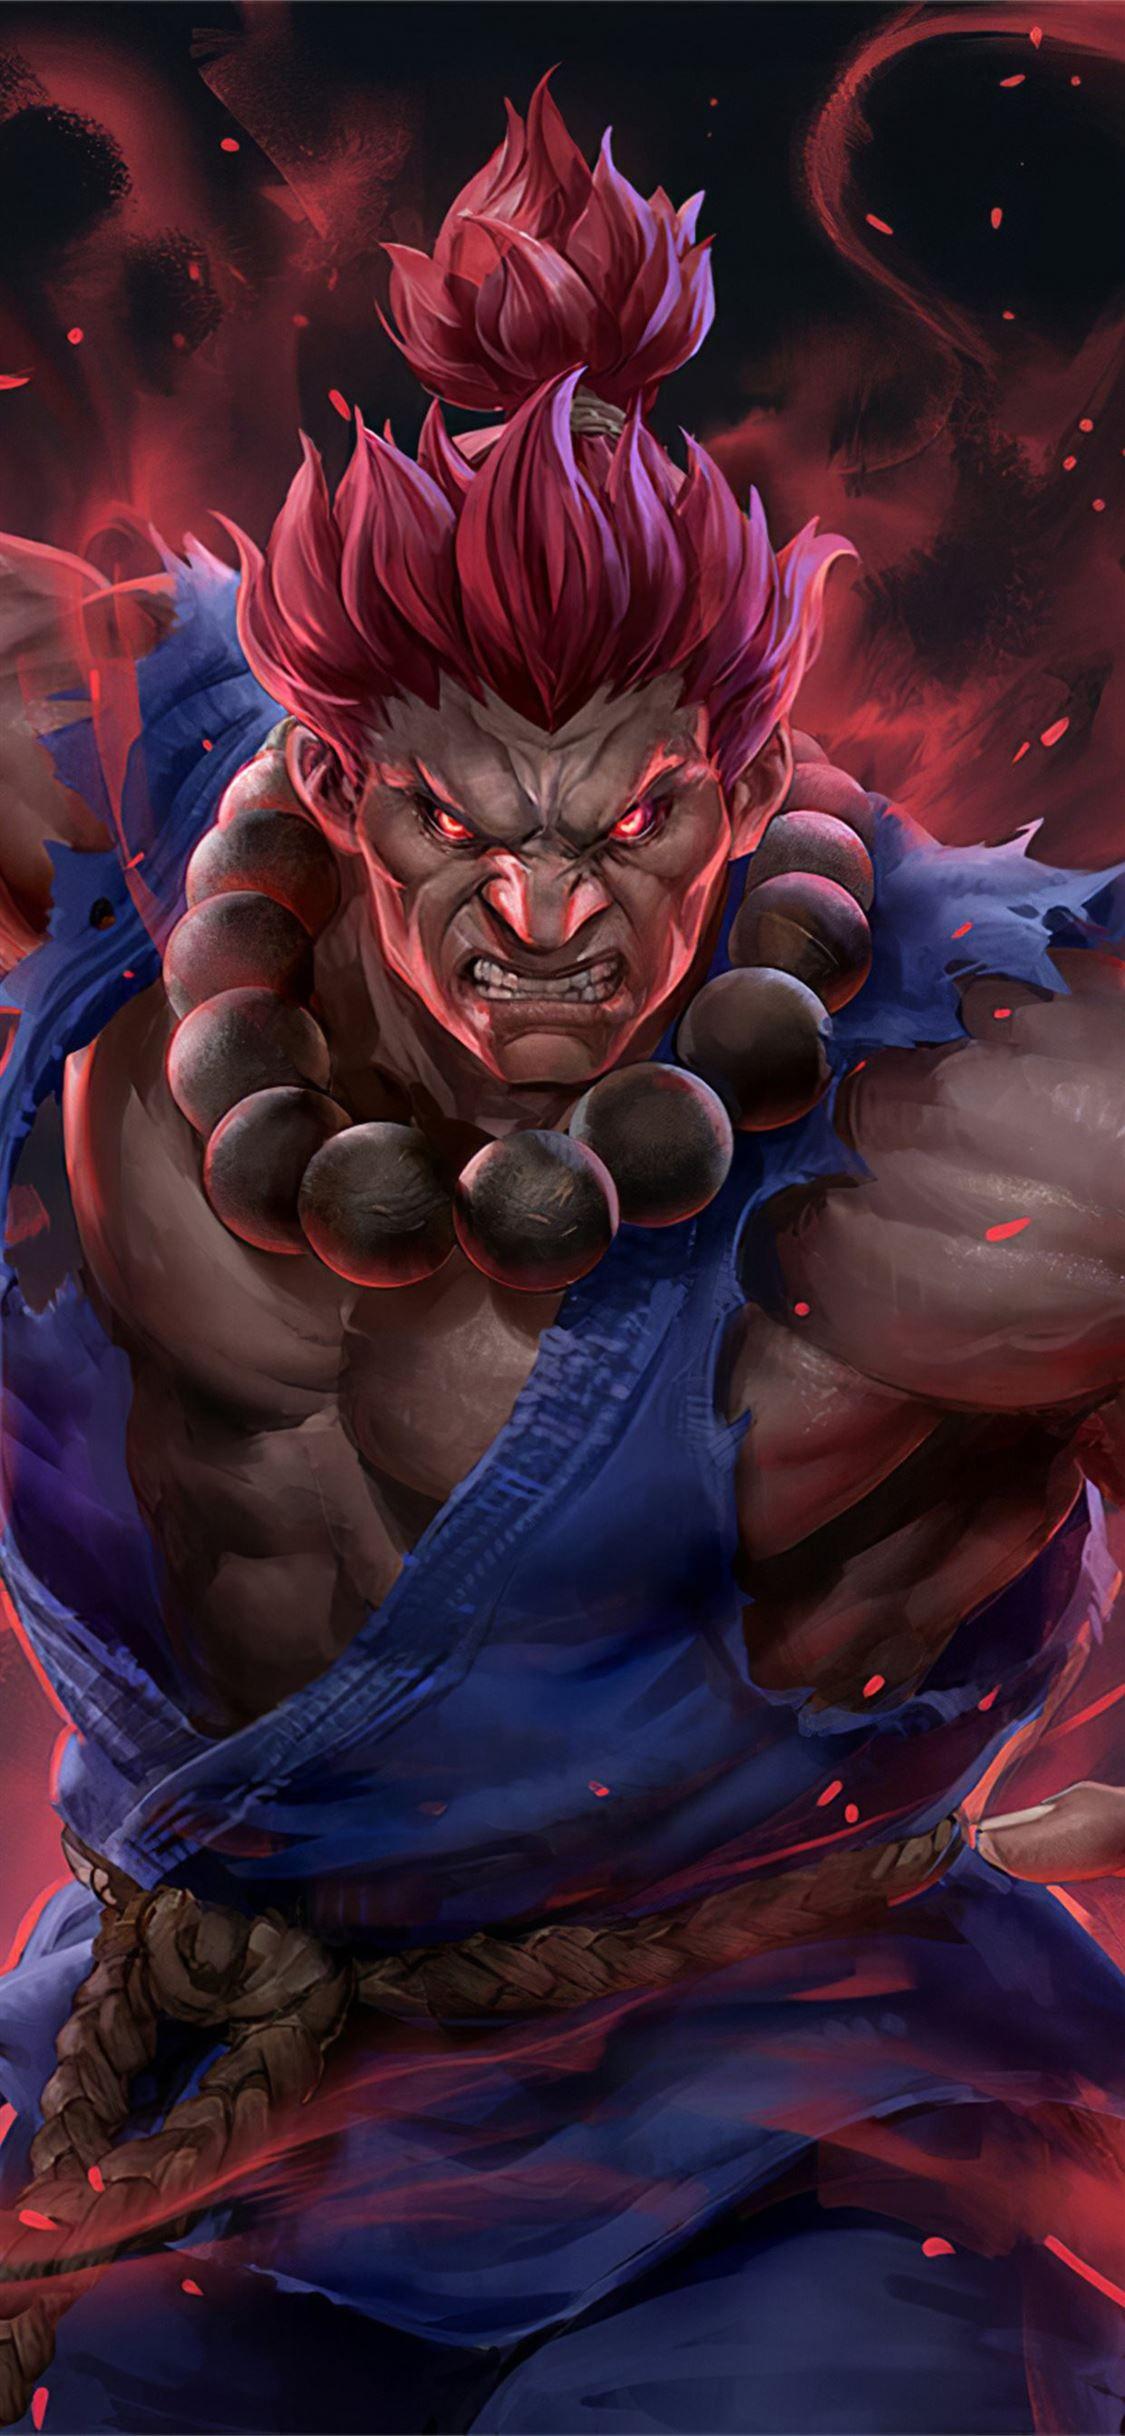 Akuma Street Fighter Artwork Streetfighterv Games 2020games 4k Artstation Iphonexwallpap Street Fighter Wallpaper Akuma Street Fighter Ryu Street Fighter